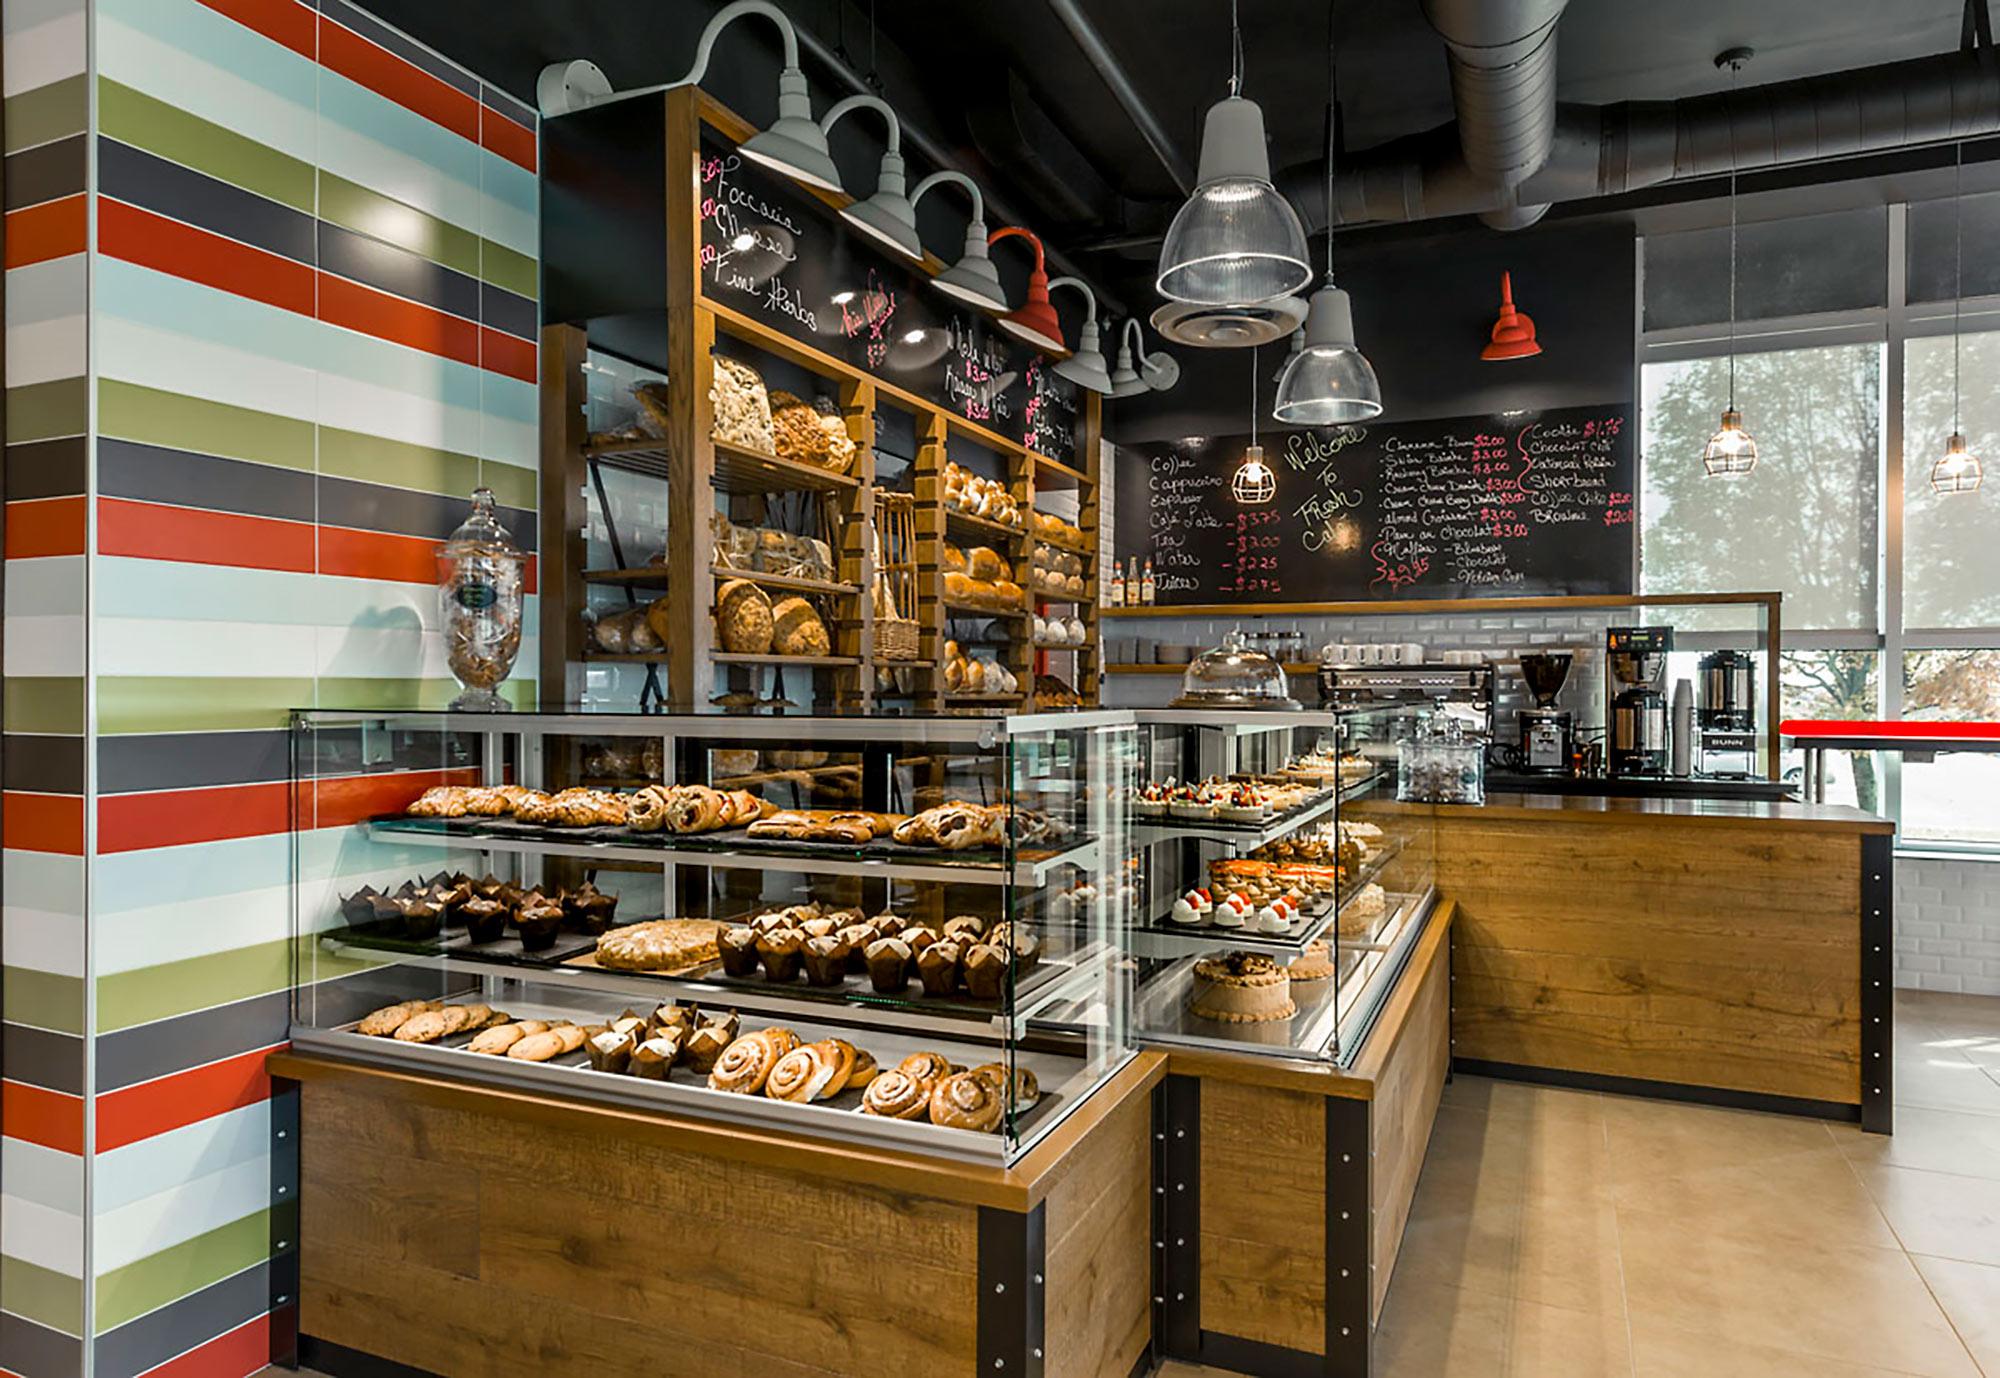 interior-design-halifax-cafe-display-case-counter.jpg